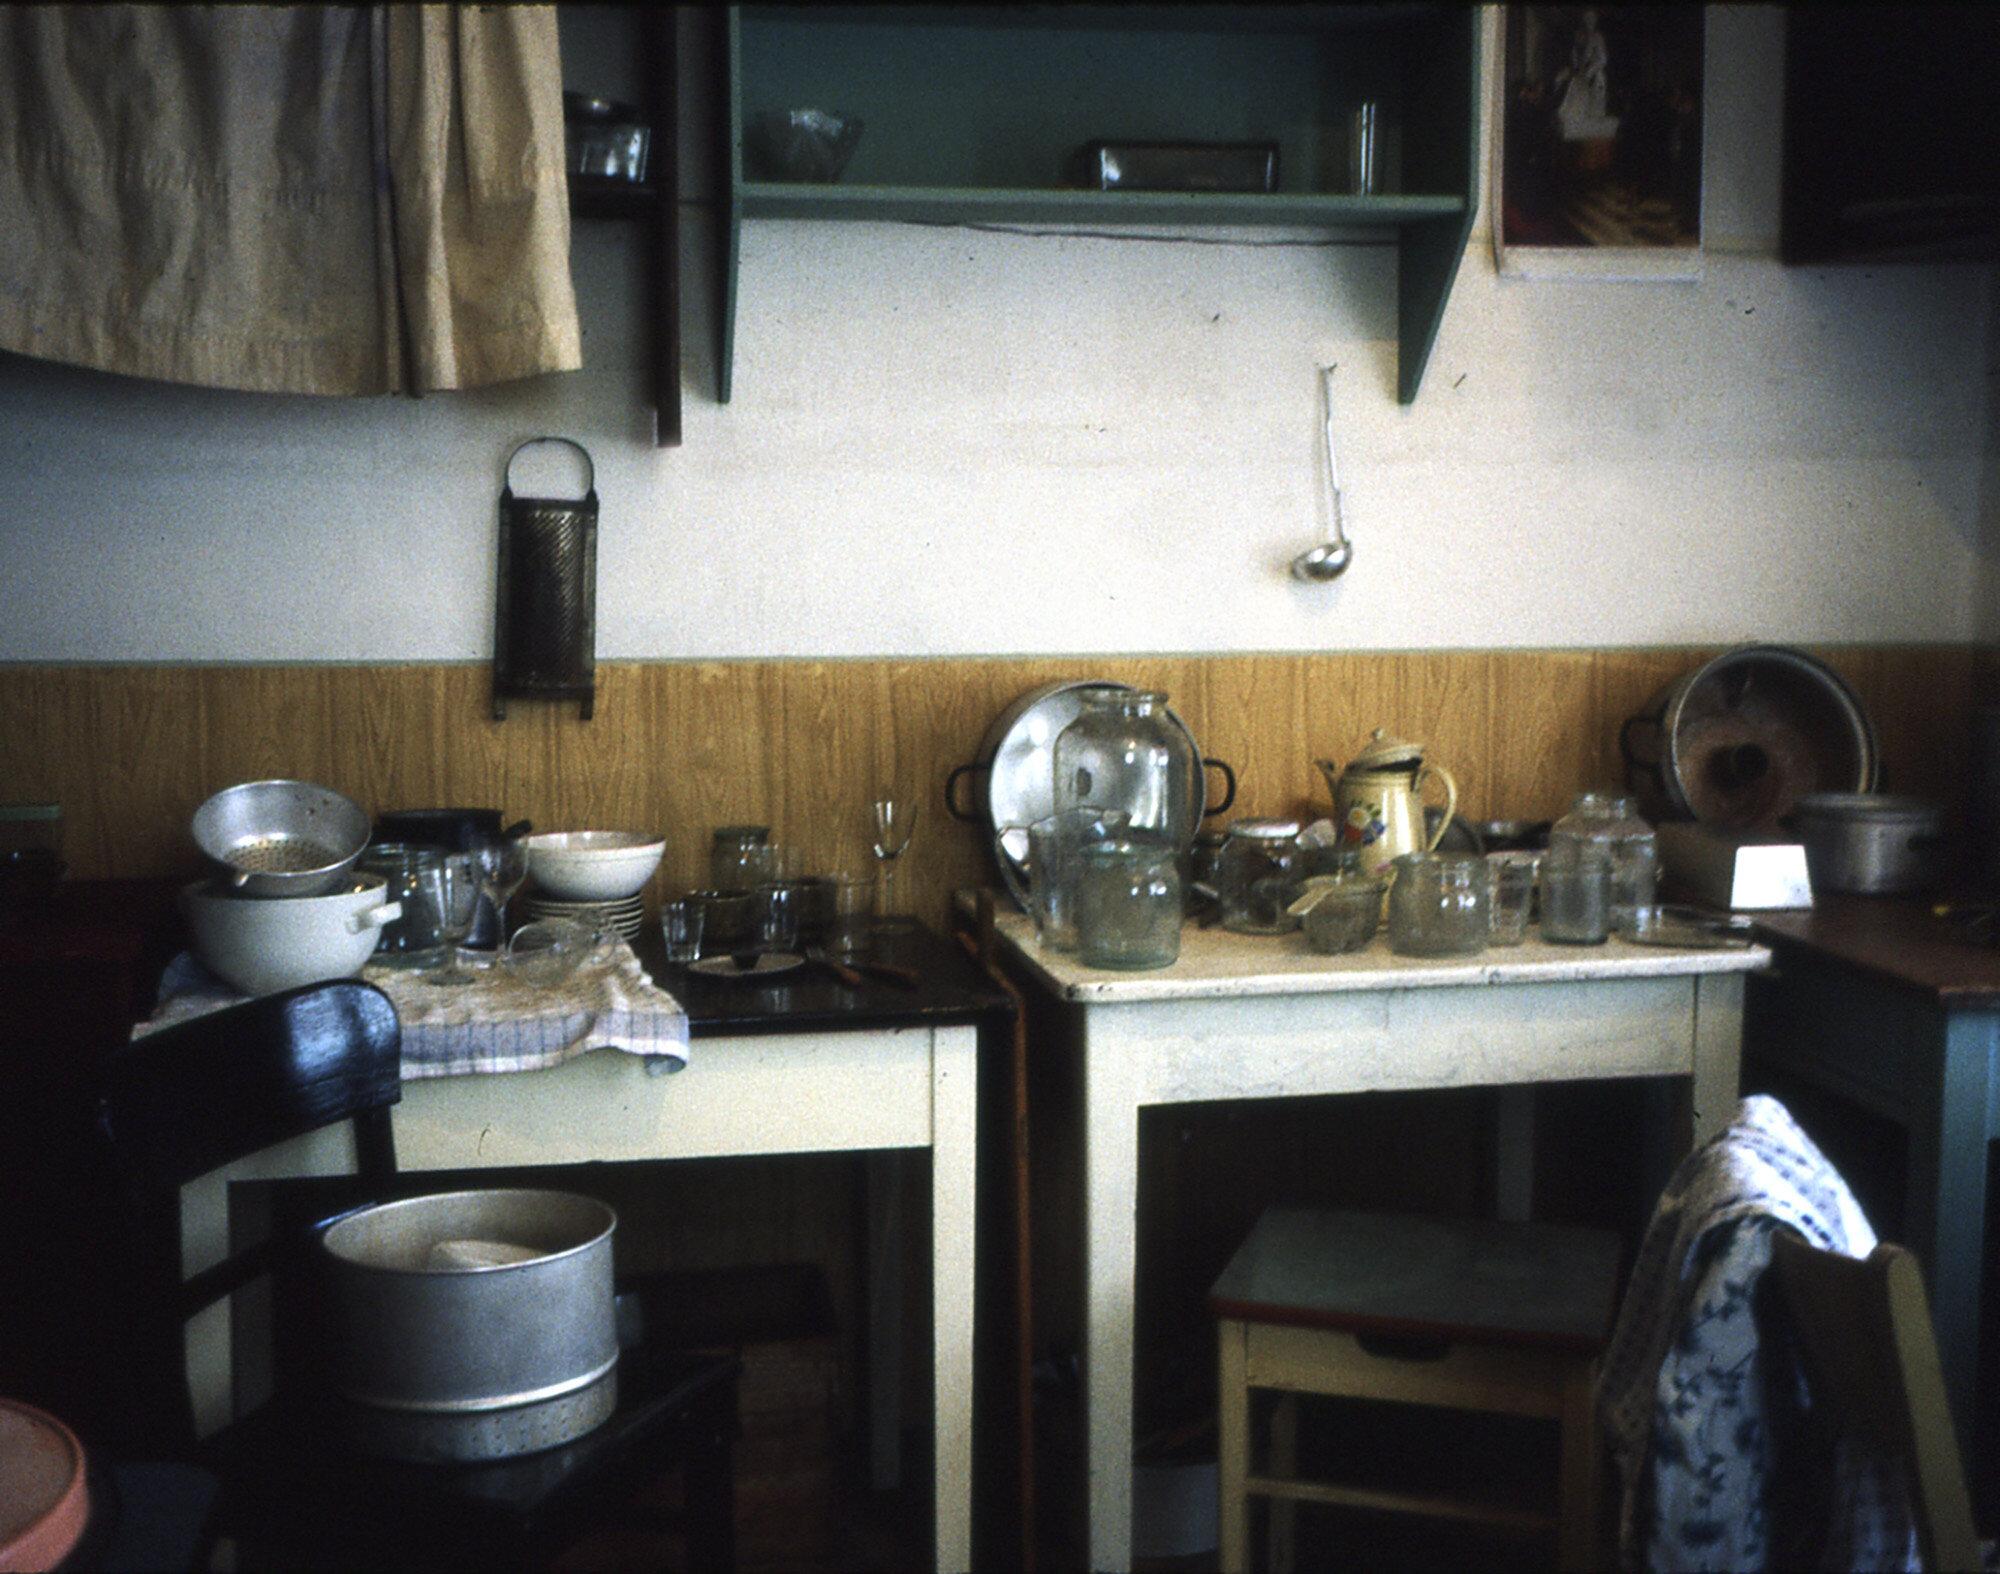 Voices-Behind-the-Door-Leipzig-1996-Photo-by-Emilia-Kabakov-005.jpg